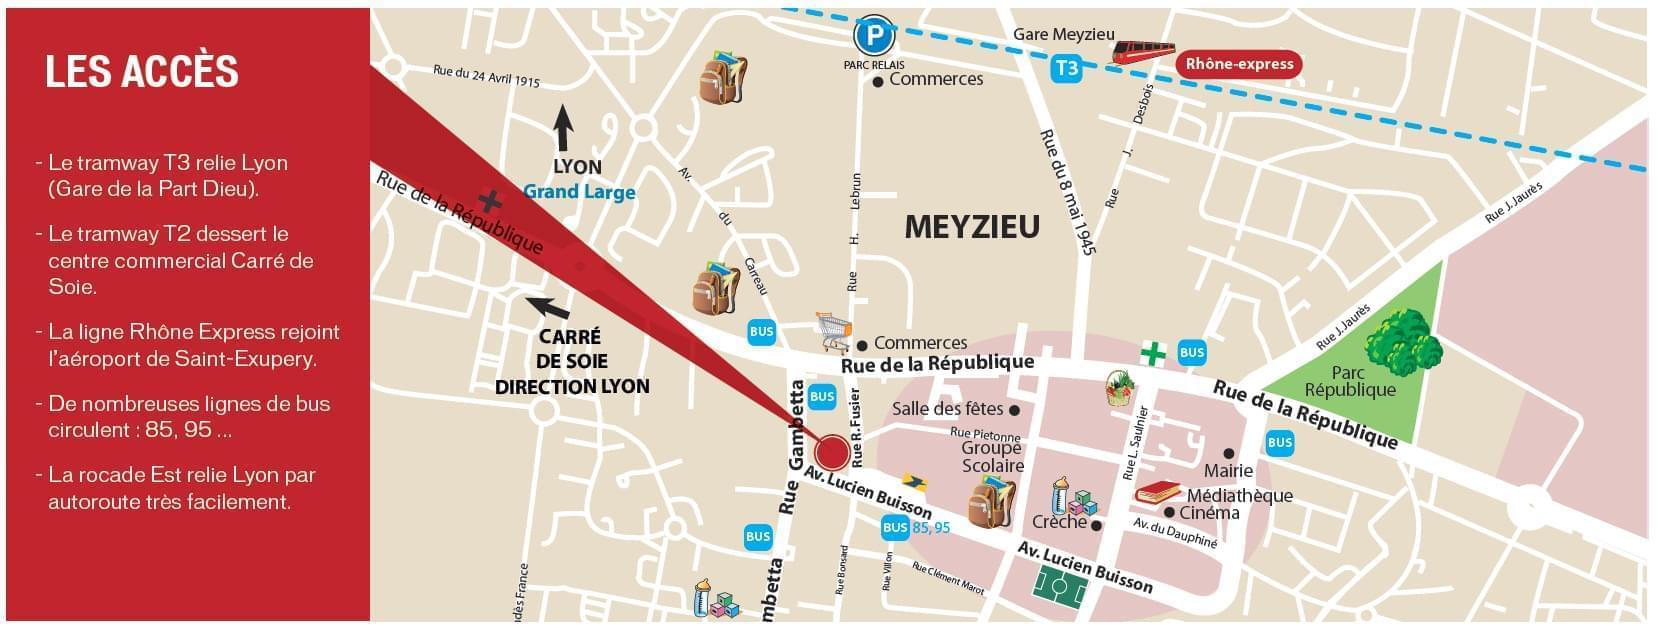 Immobilier neuf meyzieu nuanciel for Prix m2 meyzieu